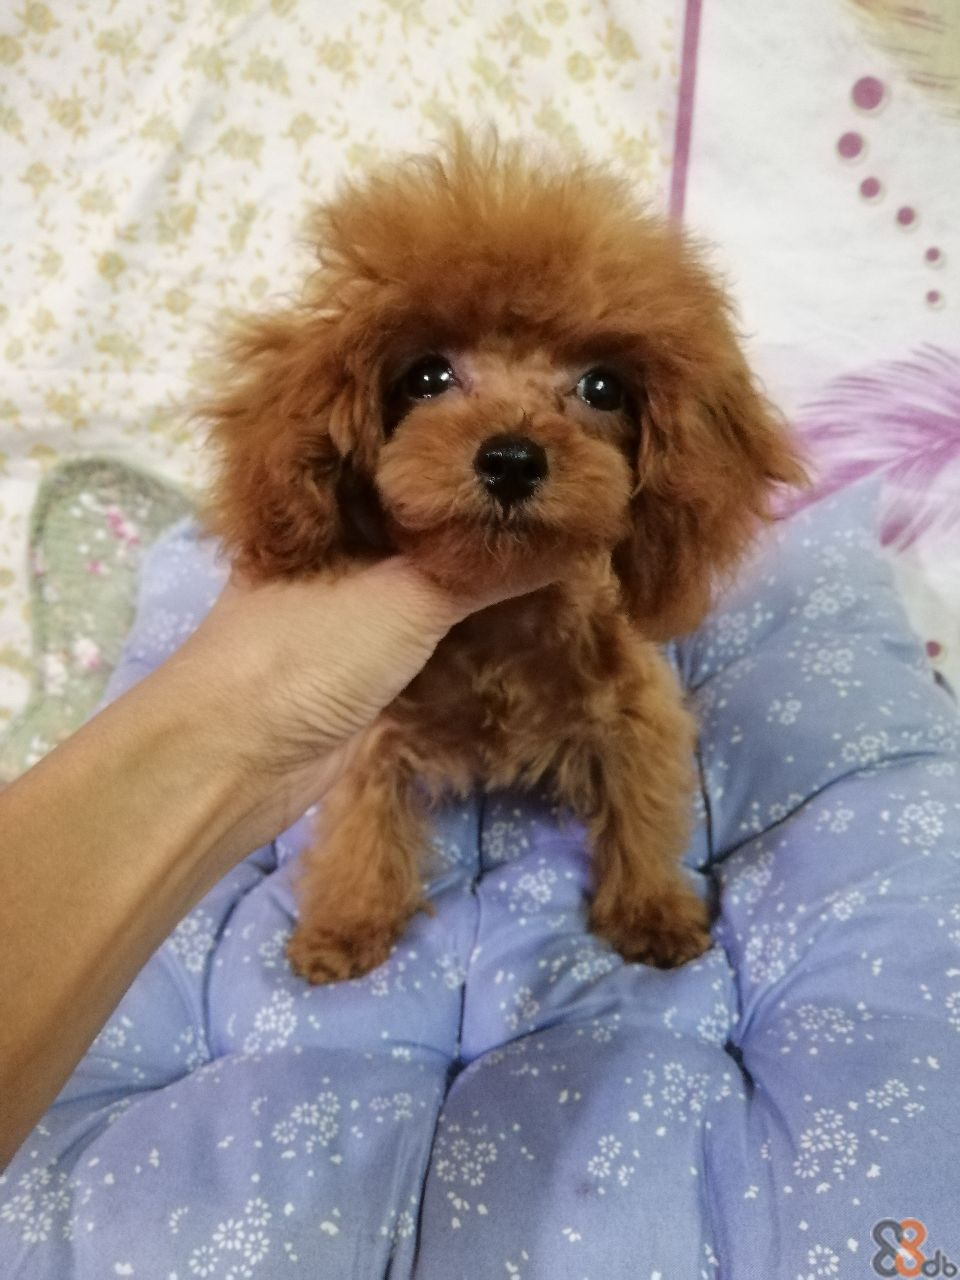 Dog,Mammal,Vertebrate,Maltepoo,Dog breed